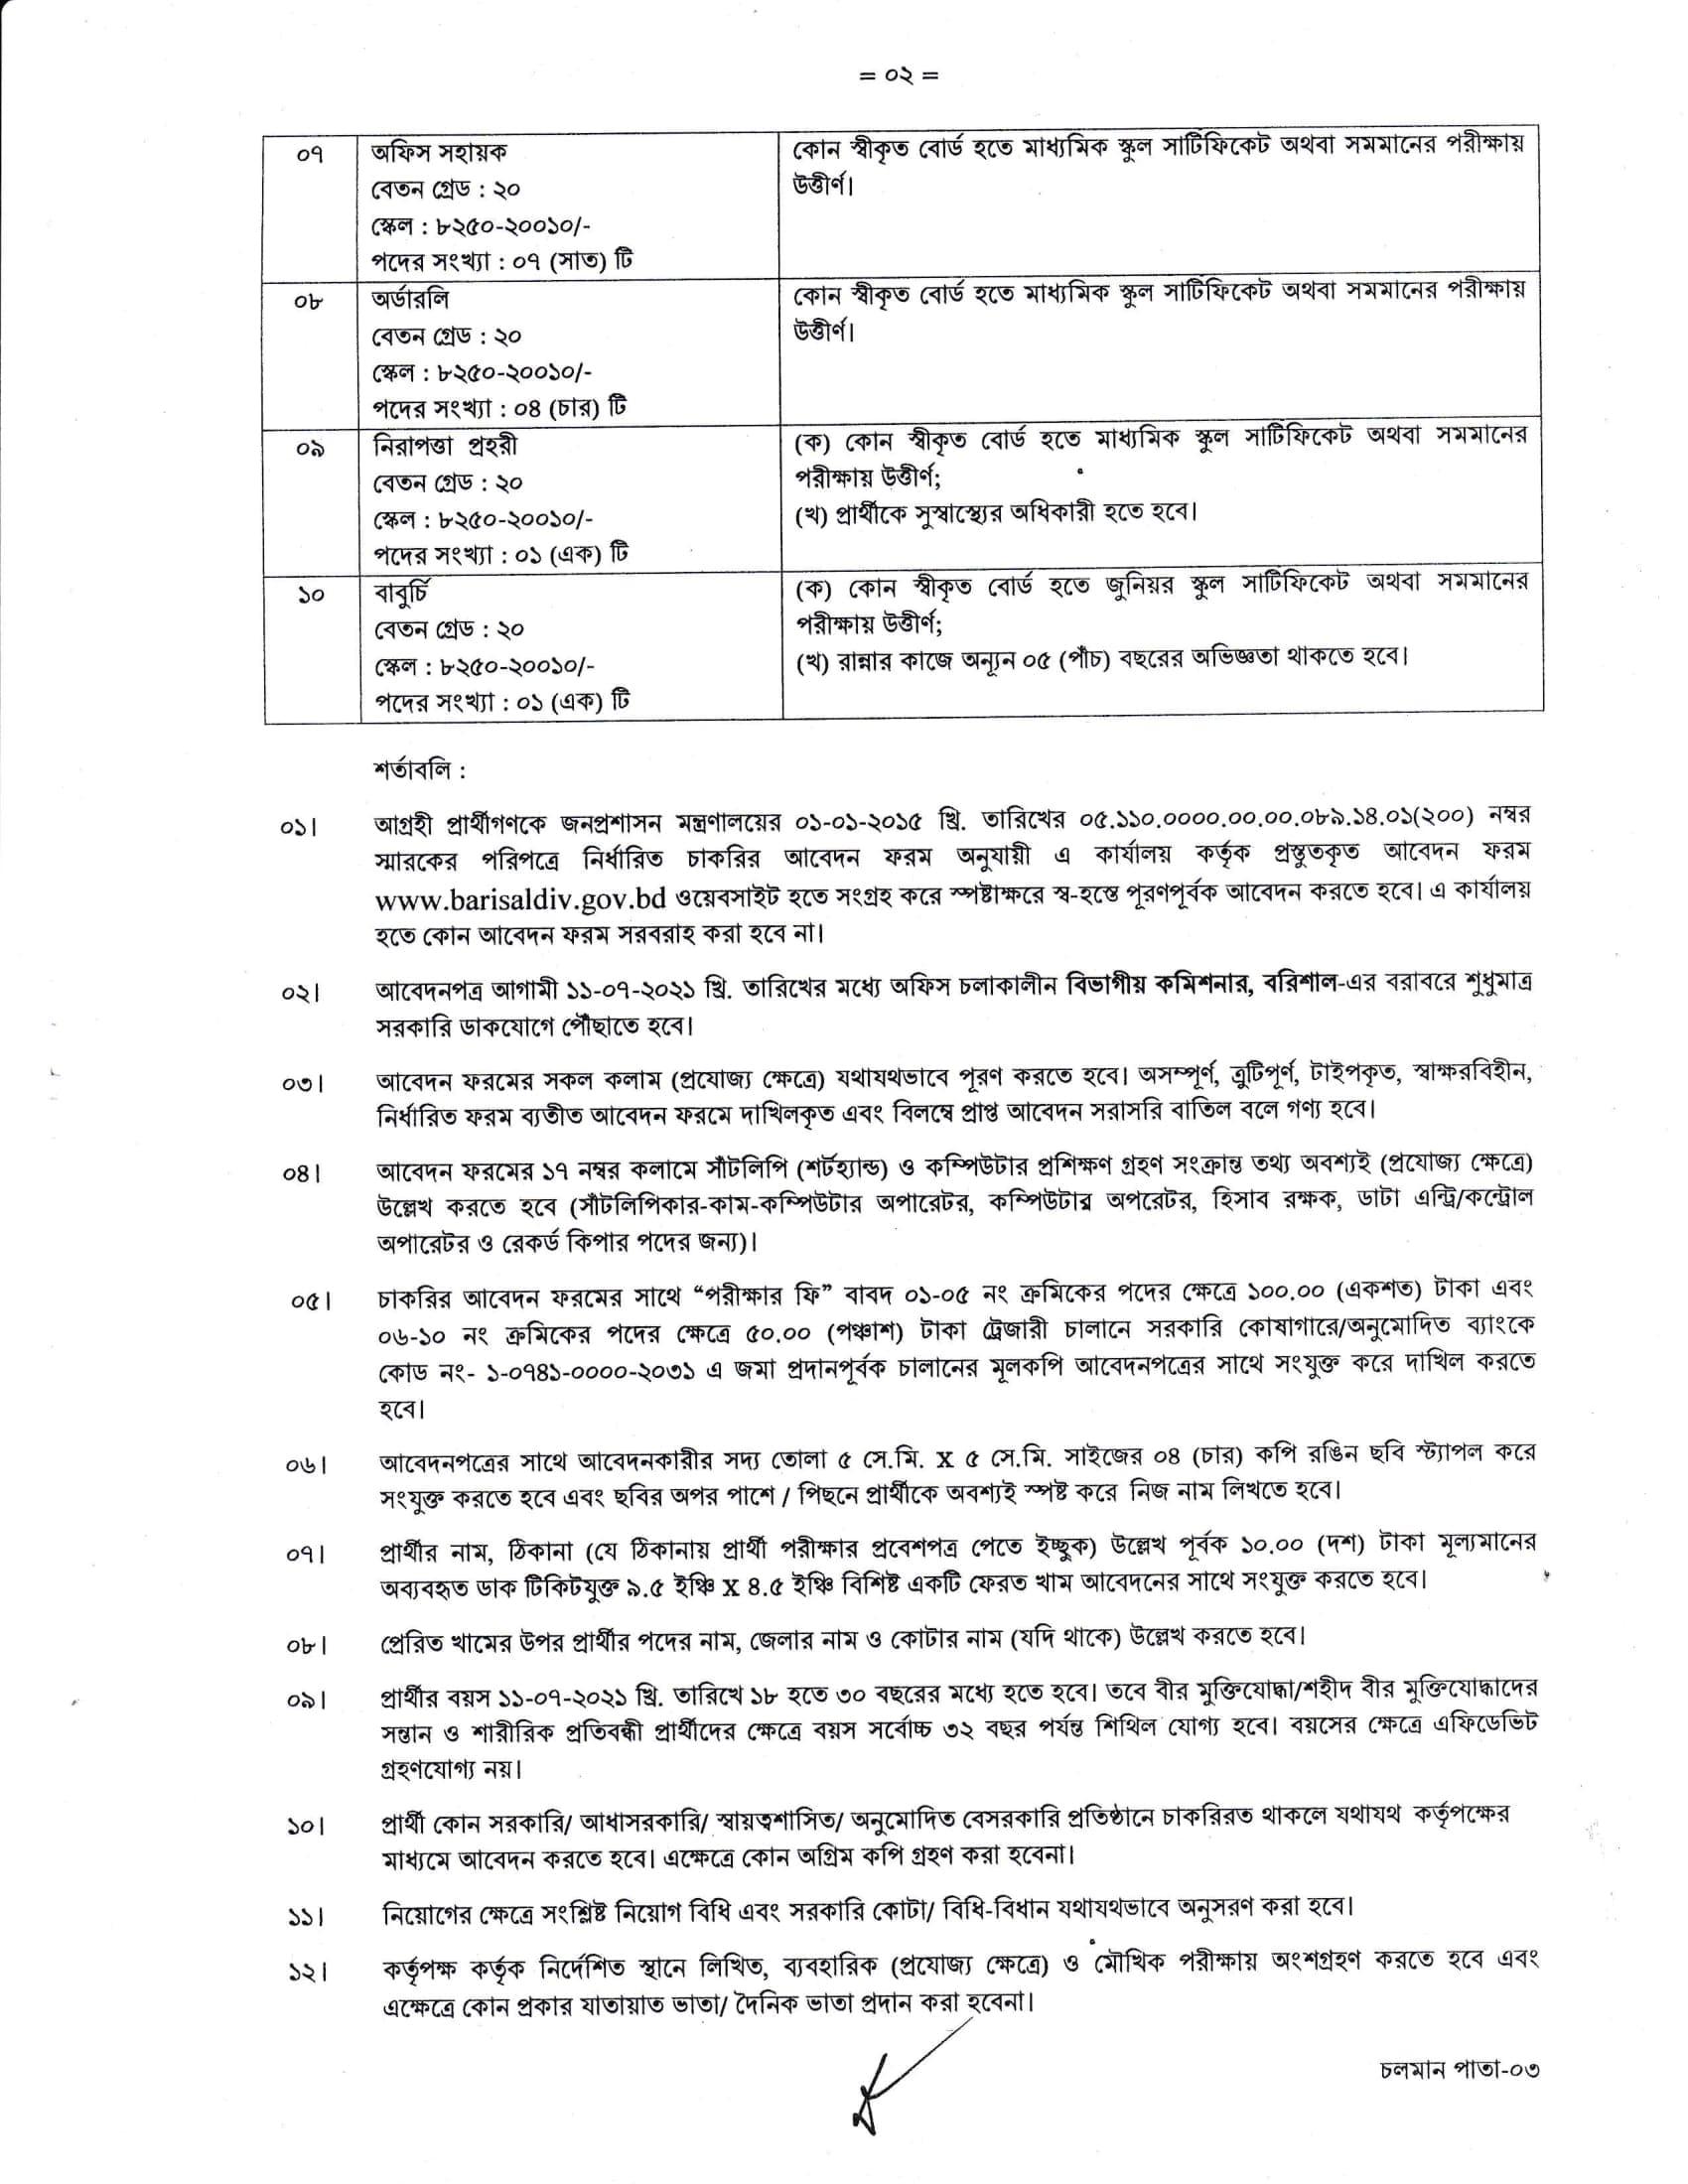 Barisal Division Job Circular